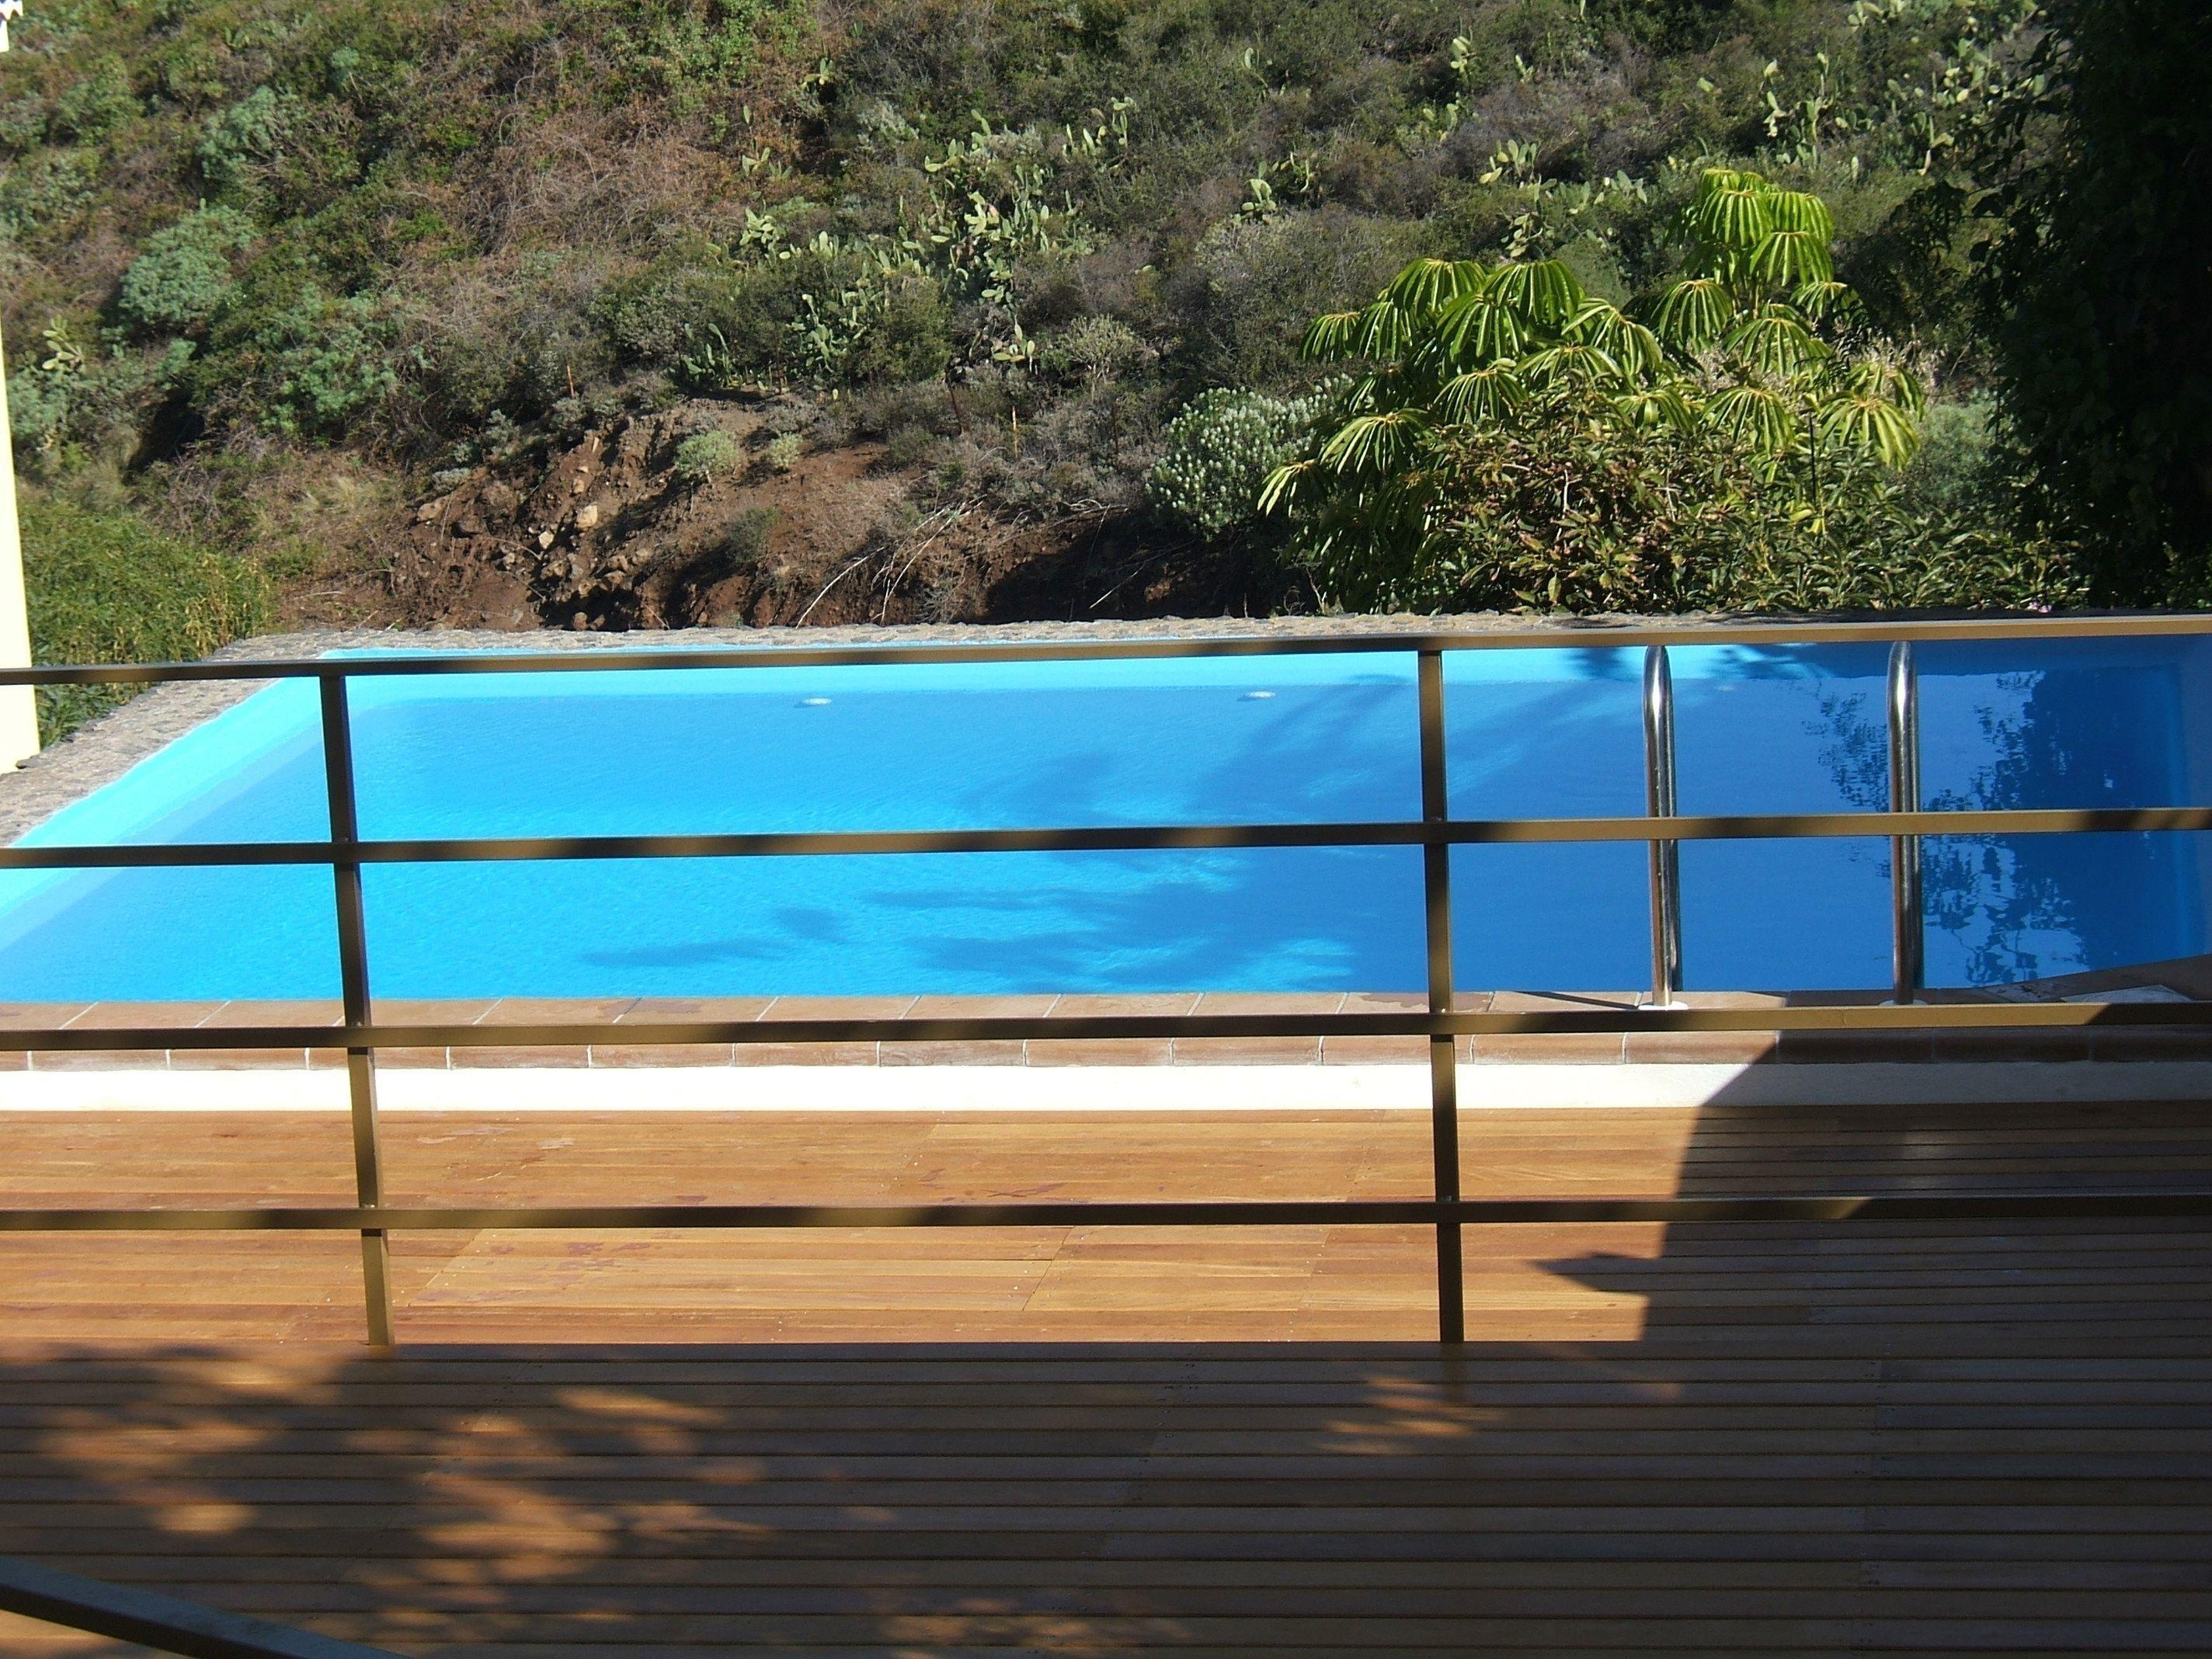 Appartement de vacances Fewo Atico Florasol, sehr ruhig direkt am Naturschutzgebiet, mit Pool, 2 Terrassen, Grill, (2492983), Santa Ursula, Ténérife, Iles Canaries, Espagne, image 20